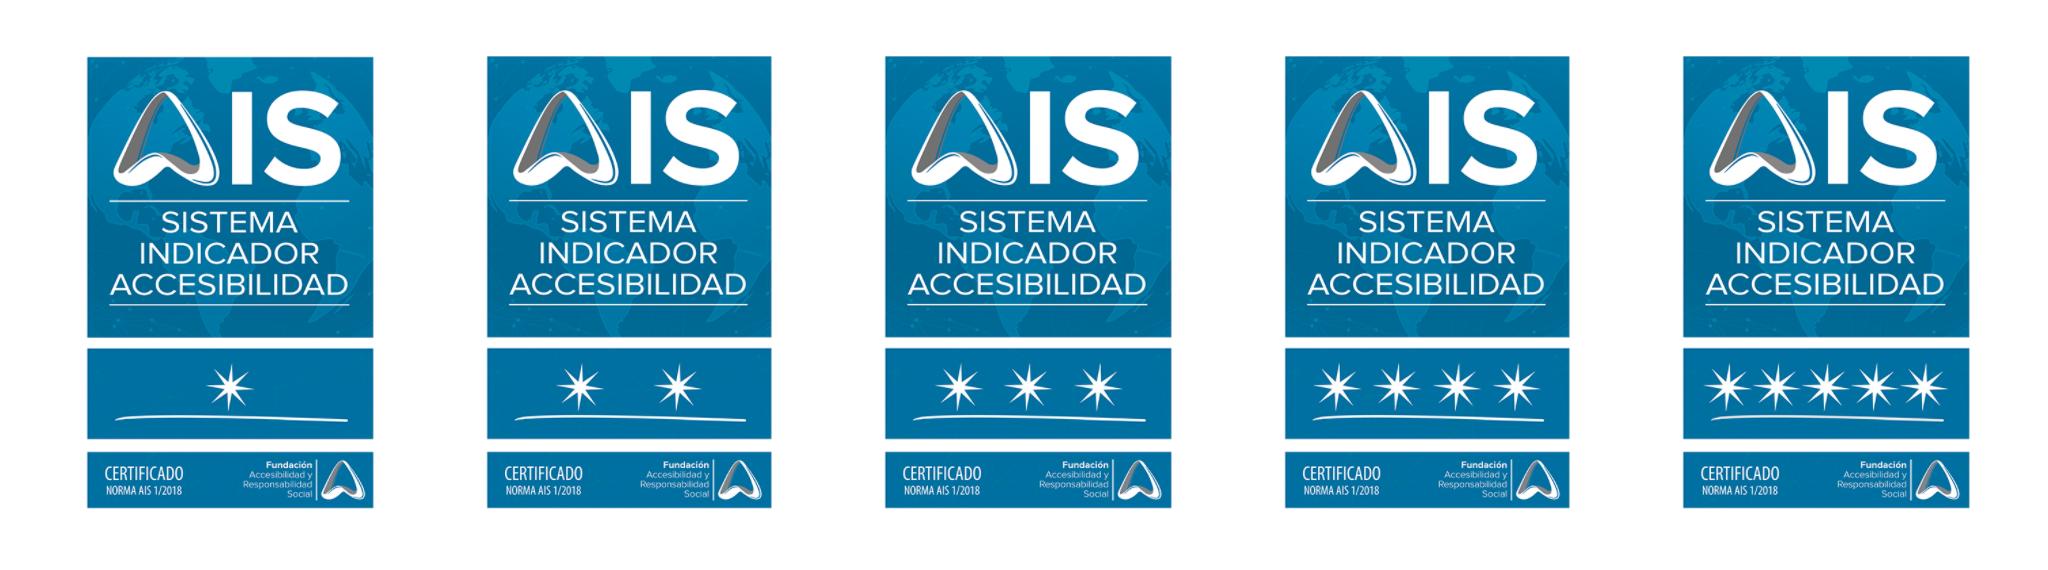 Aparecen las placas AIS ordenadas de 1 estrella a 5